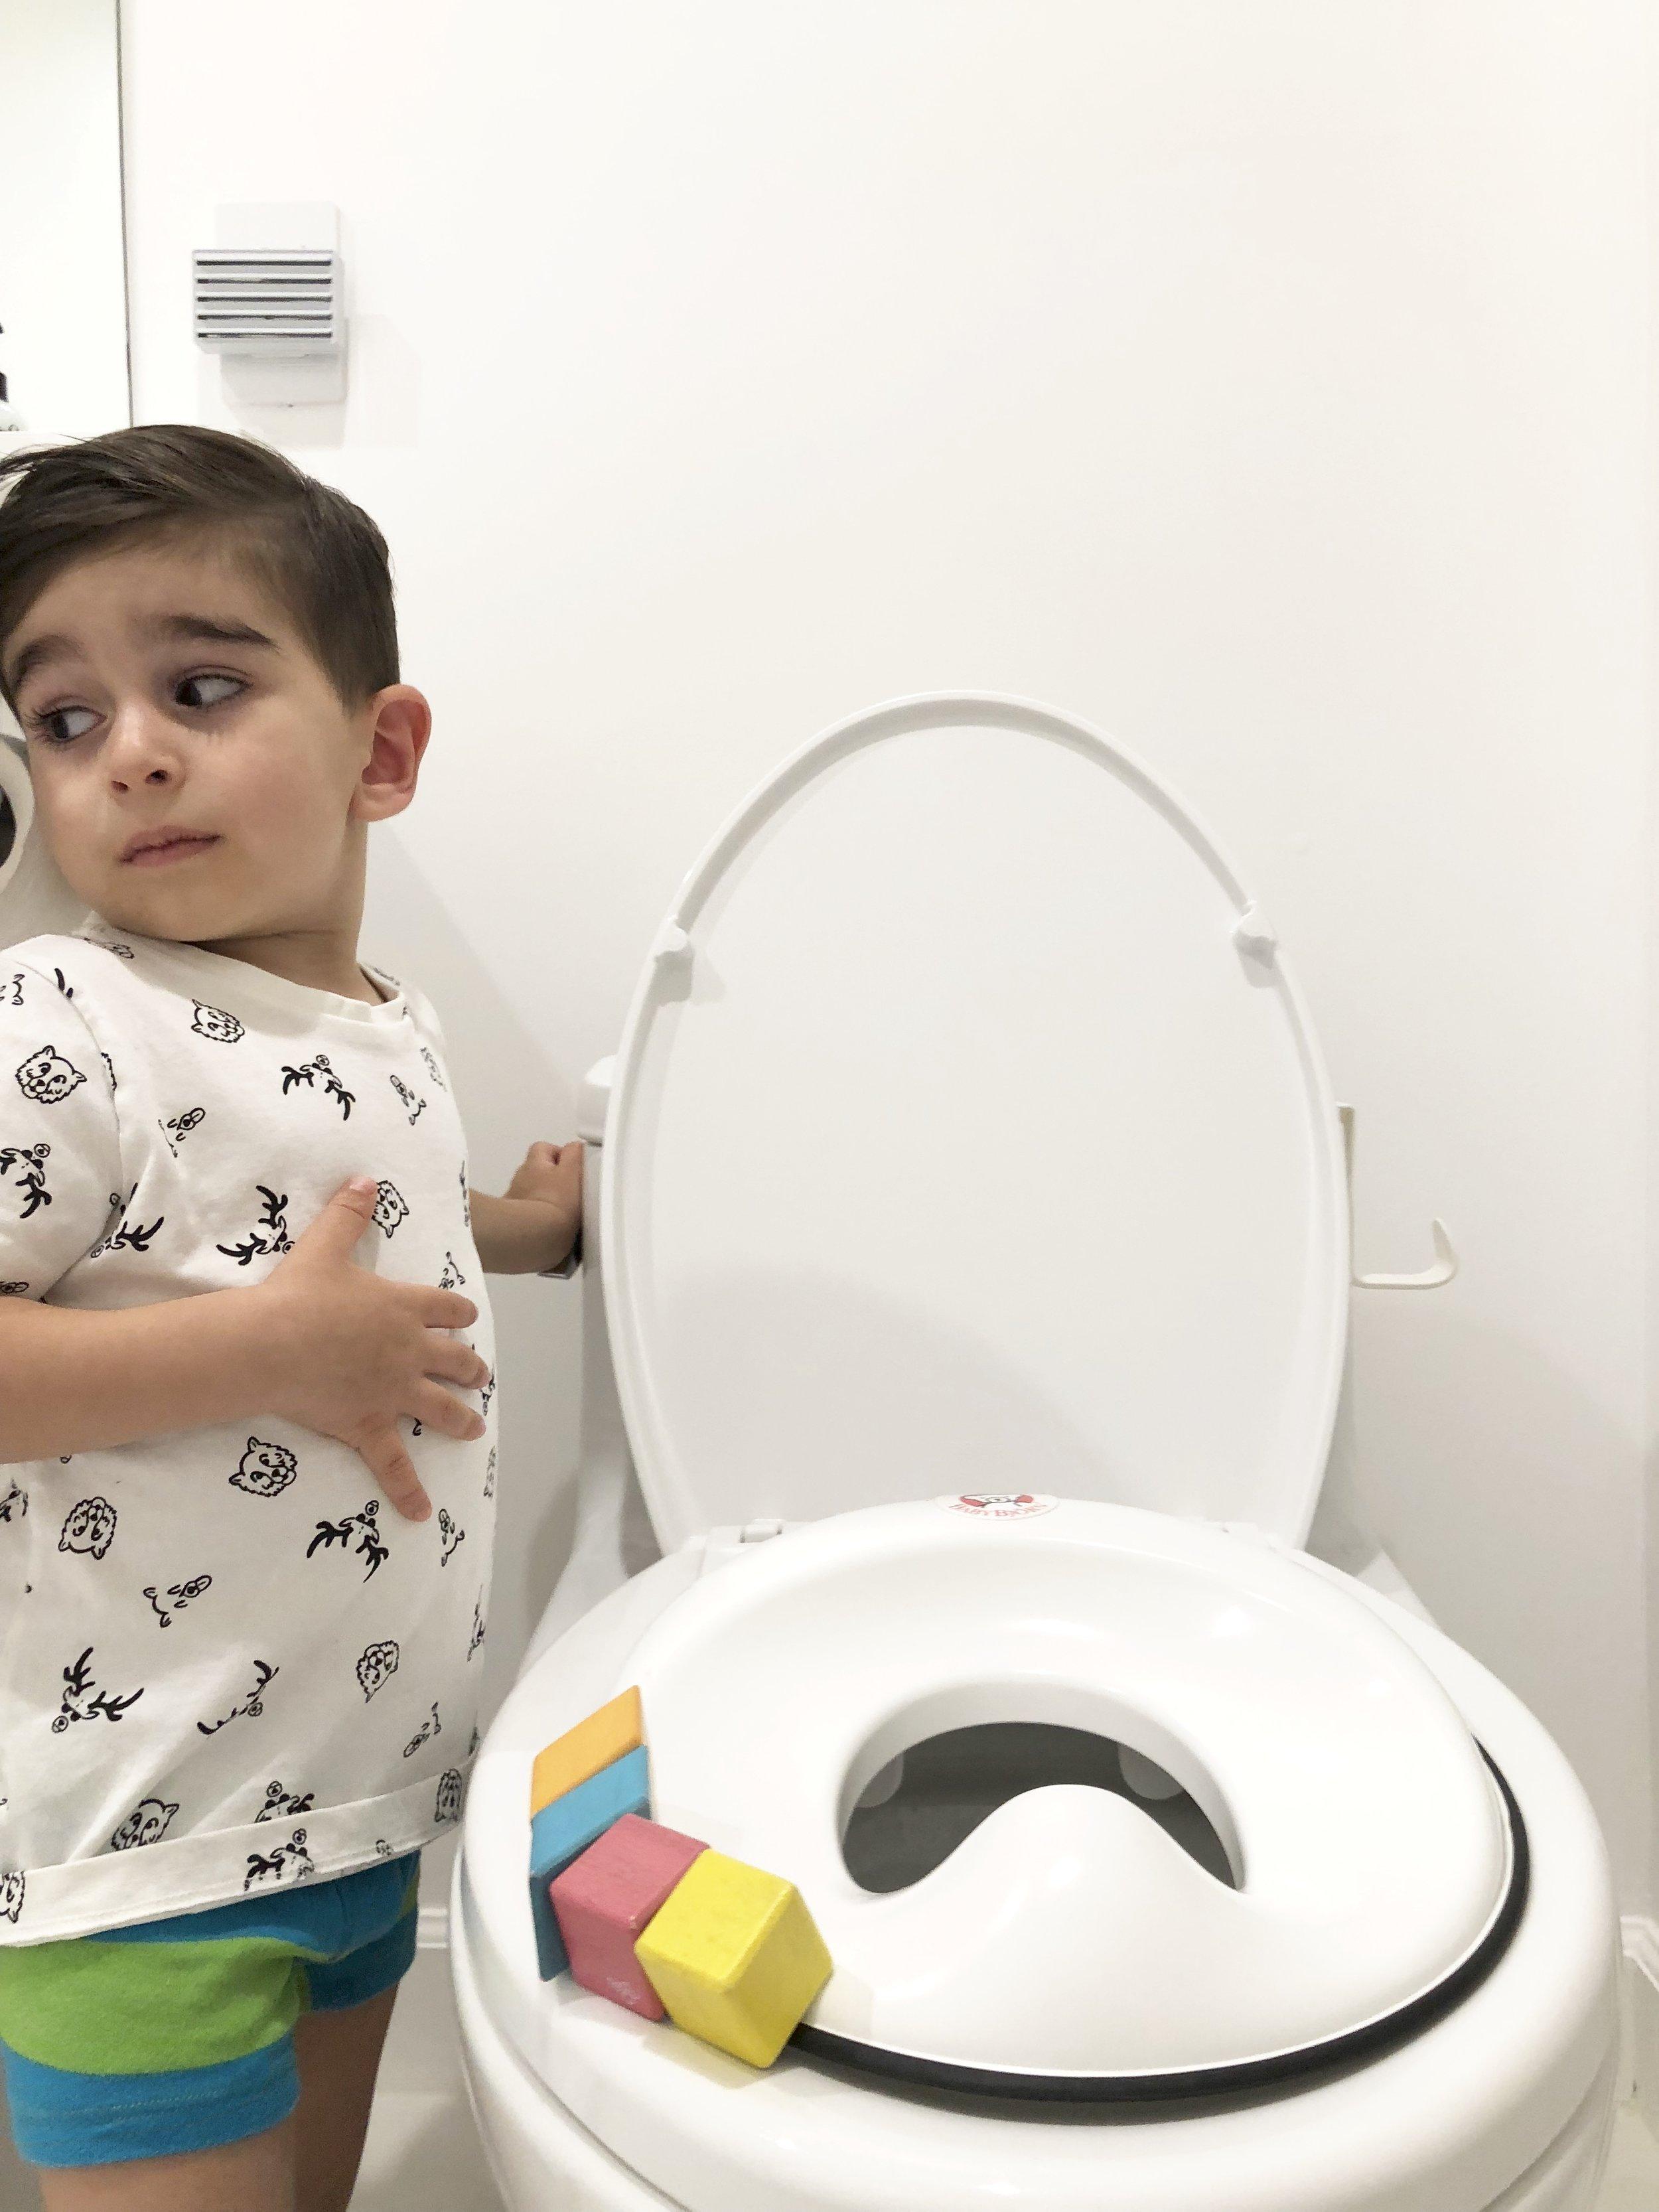 potty-training-tips.jpg